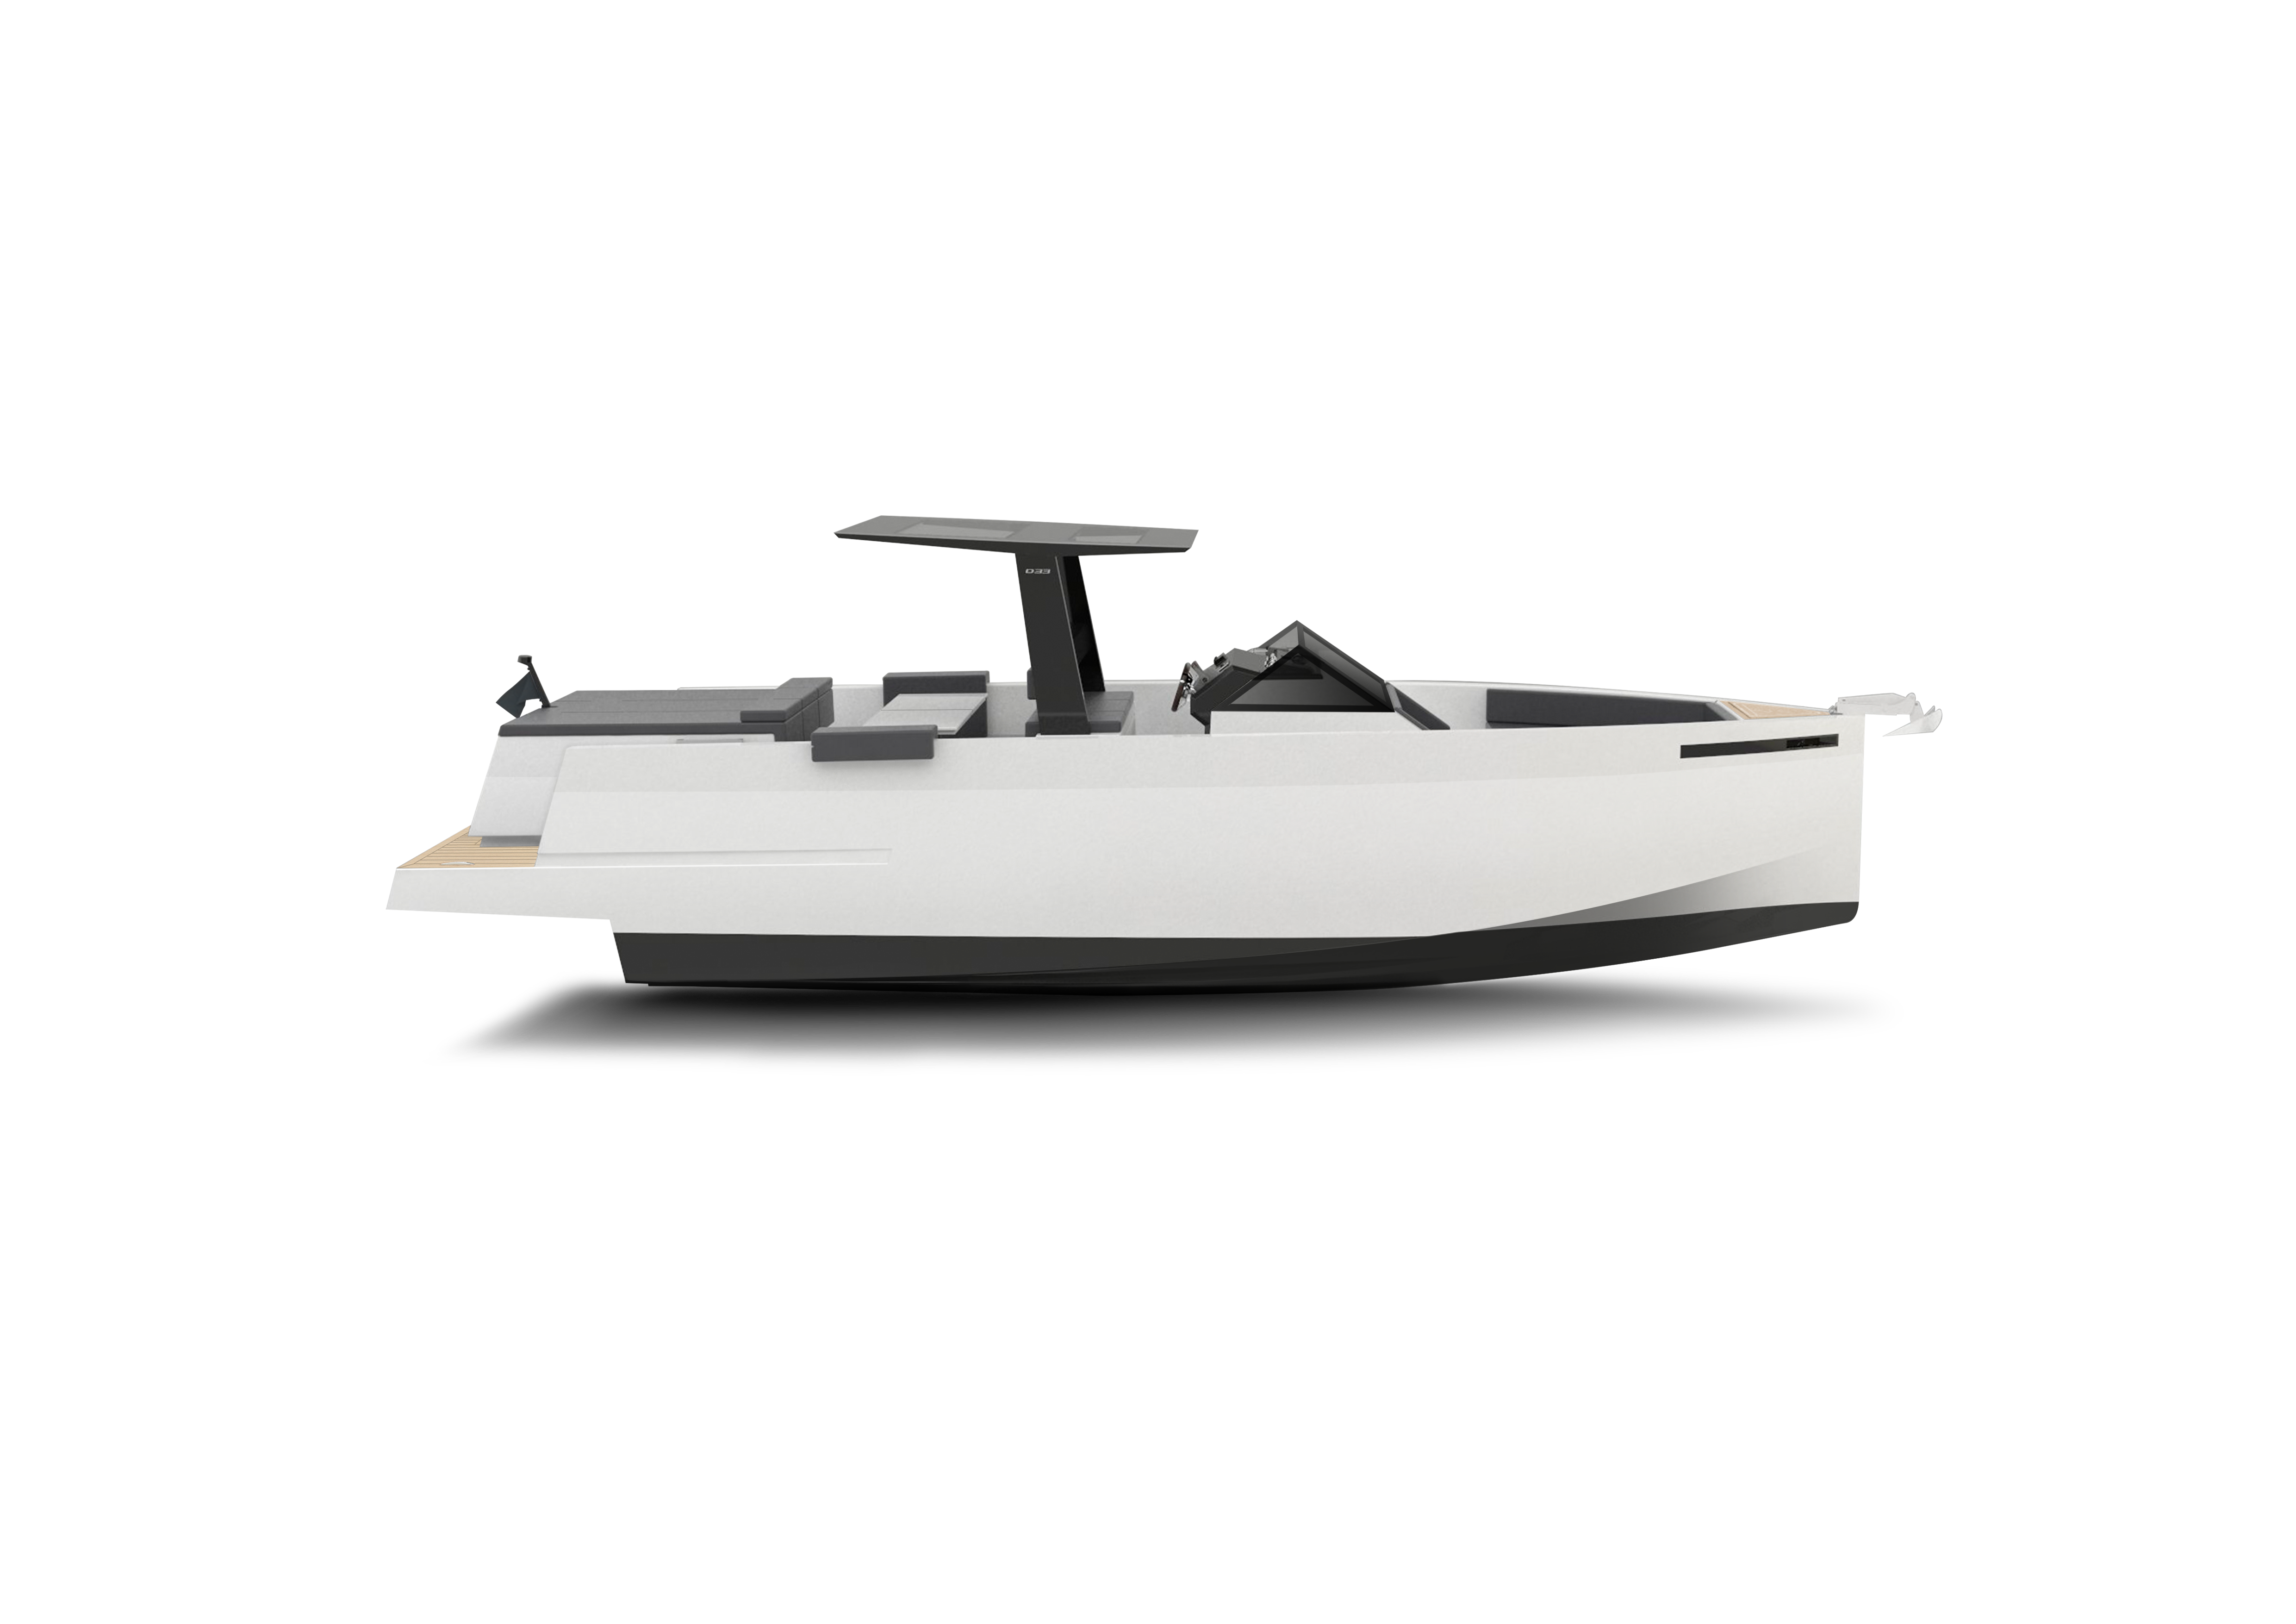 De Antonio Yachts_D33 Open_Perfil_01